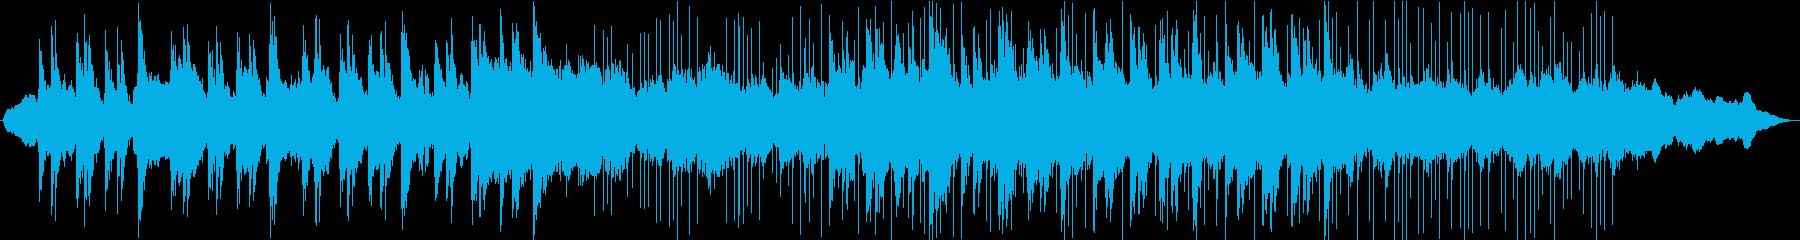 KANTアラビアの夜的なBGM0807の再生済みの波形